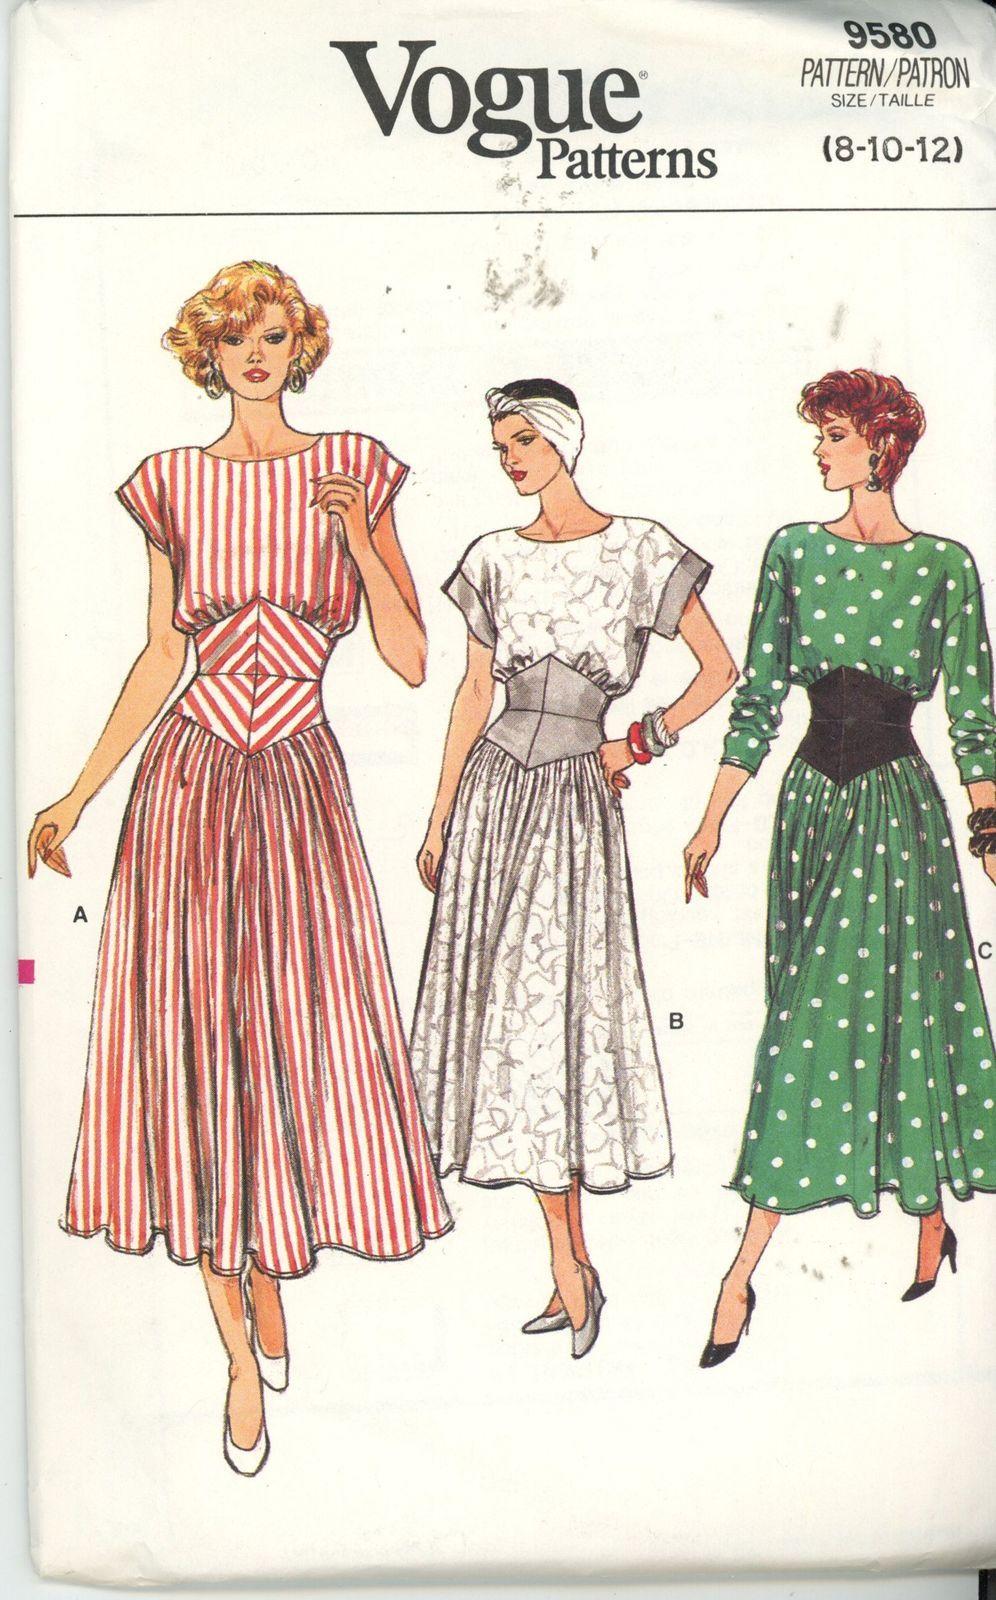 Vogue 9580 ladies dresses rare vintage sewing pattern sizes 8 vogue 9580 ladies dresses rare vintage sewing pattern sizes 8 10 jeuxipadfo Choice Image